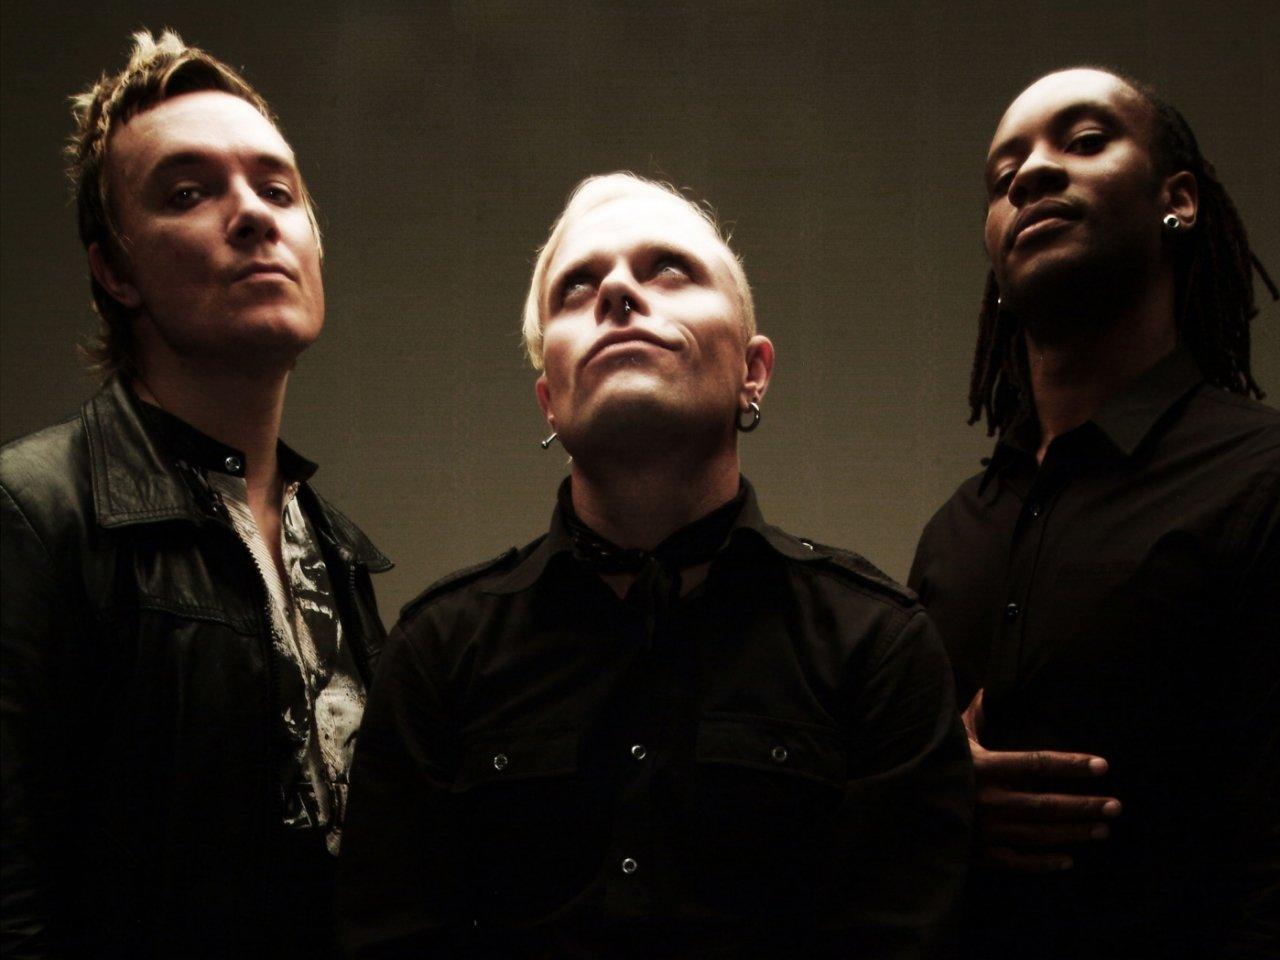 The Prodigy: Exit i promo album